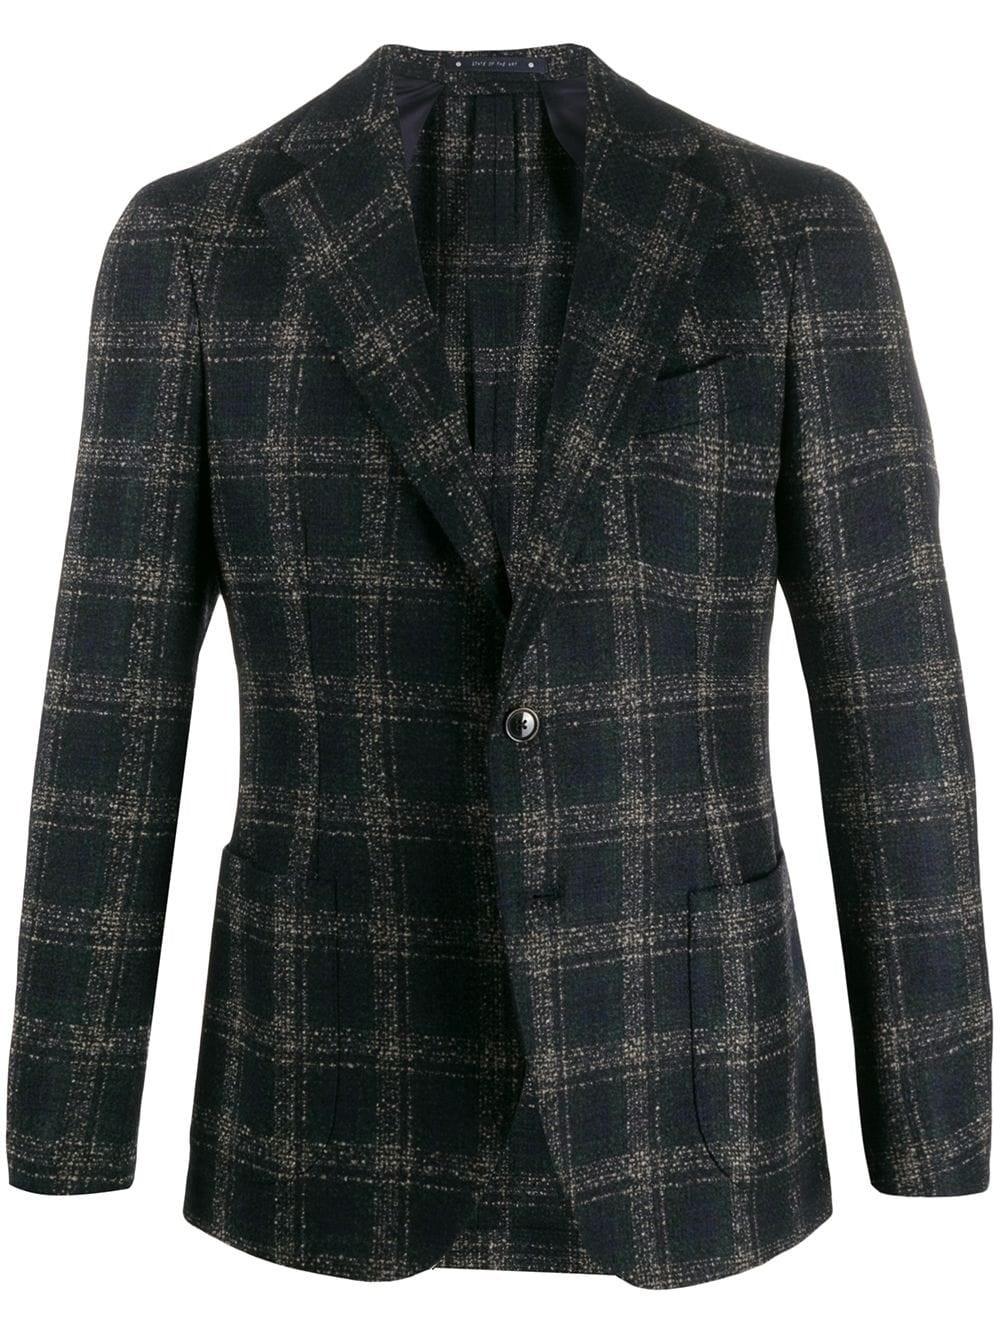 AL DUCA D'AOSTA 1902 Check Pattern Blazer